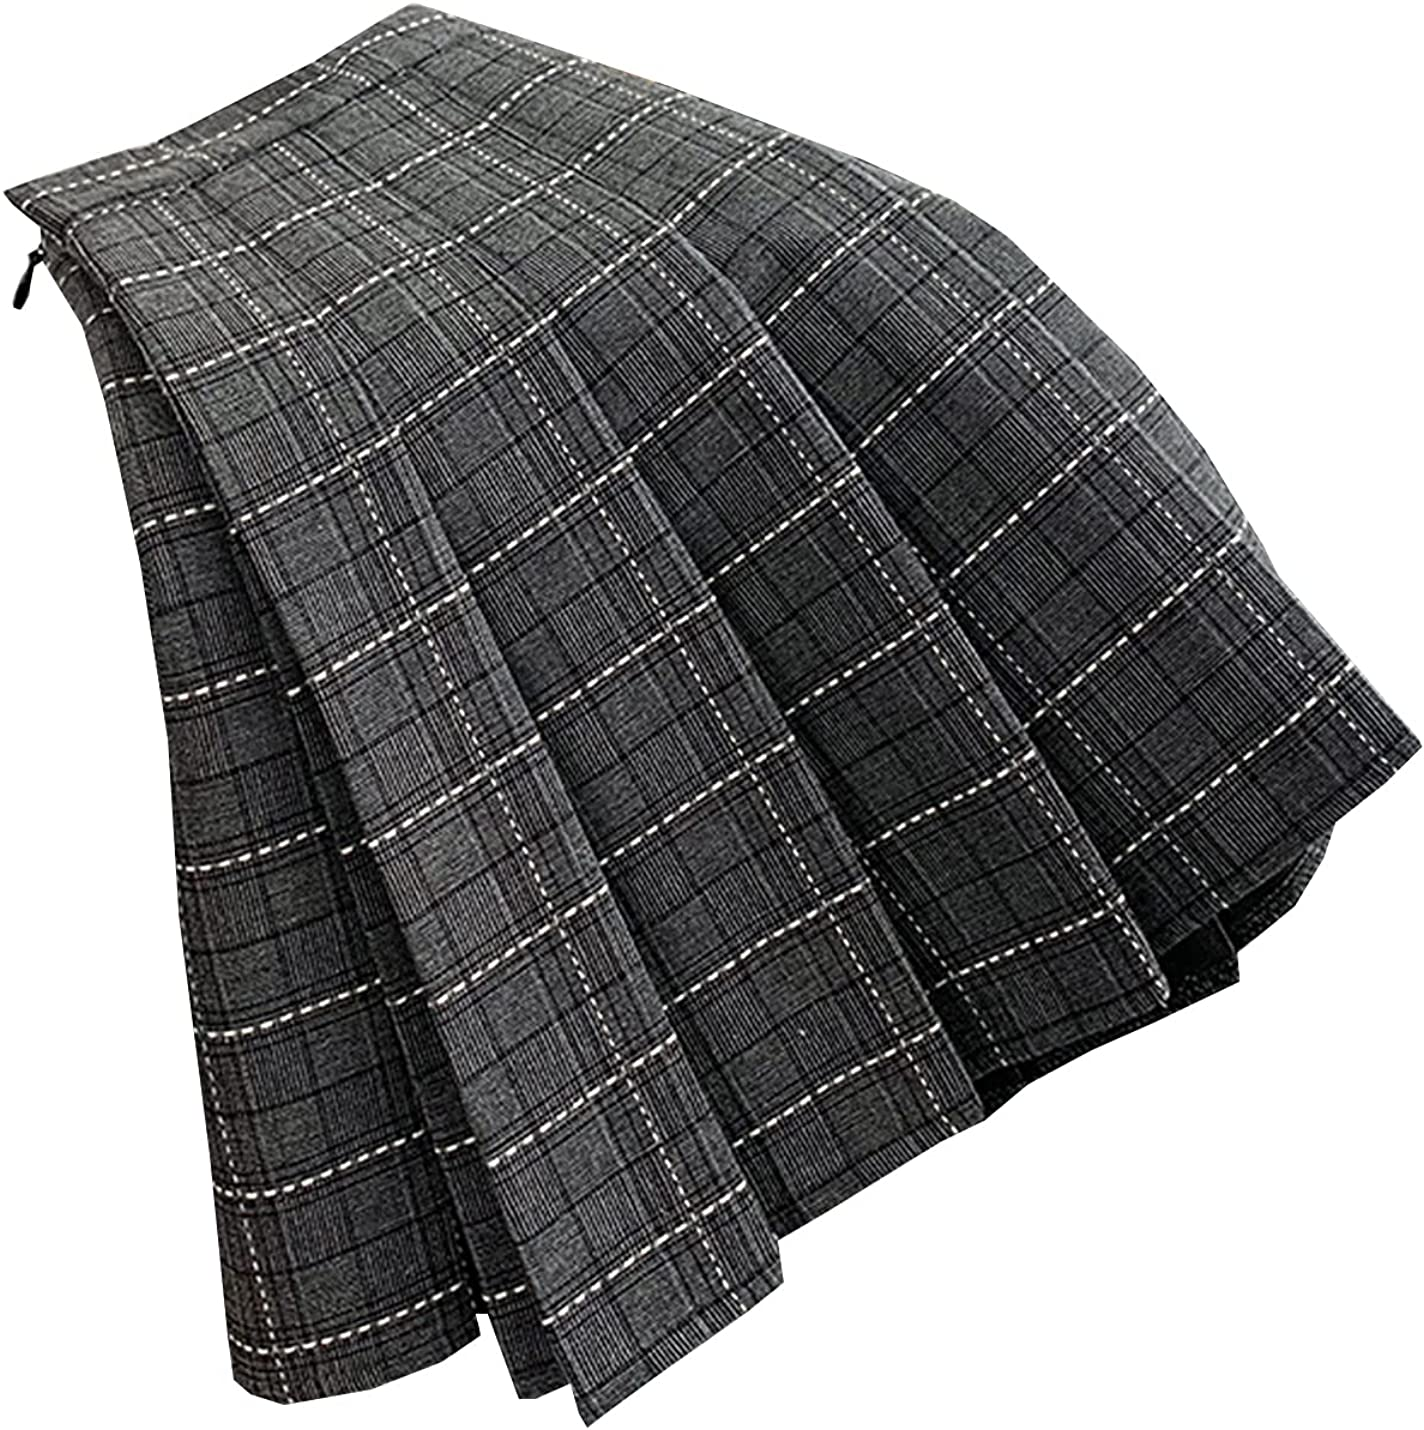 IKIIO Women's Fashion Casual Loose Fit Pleated High Waisted Plaid Skirt A Line Skirts